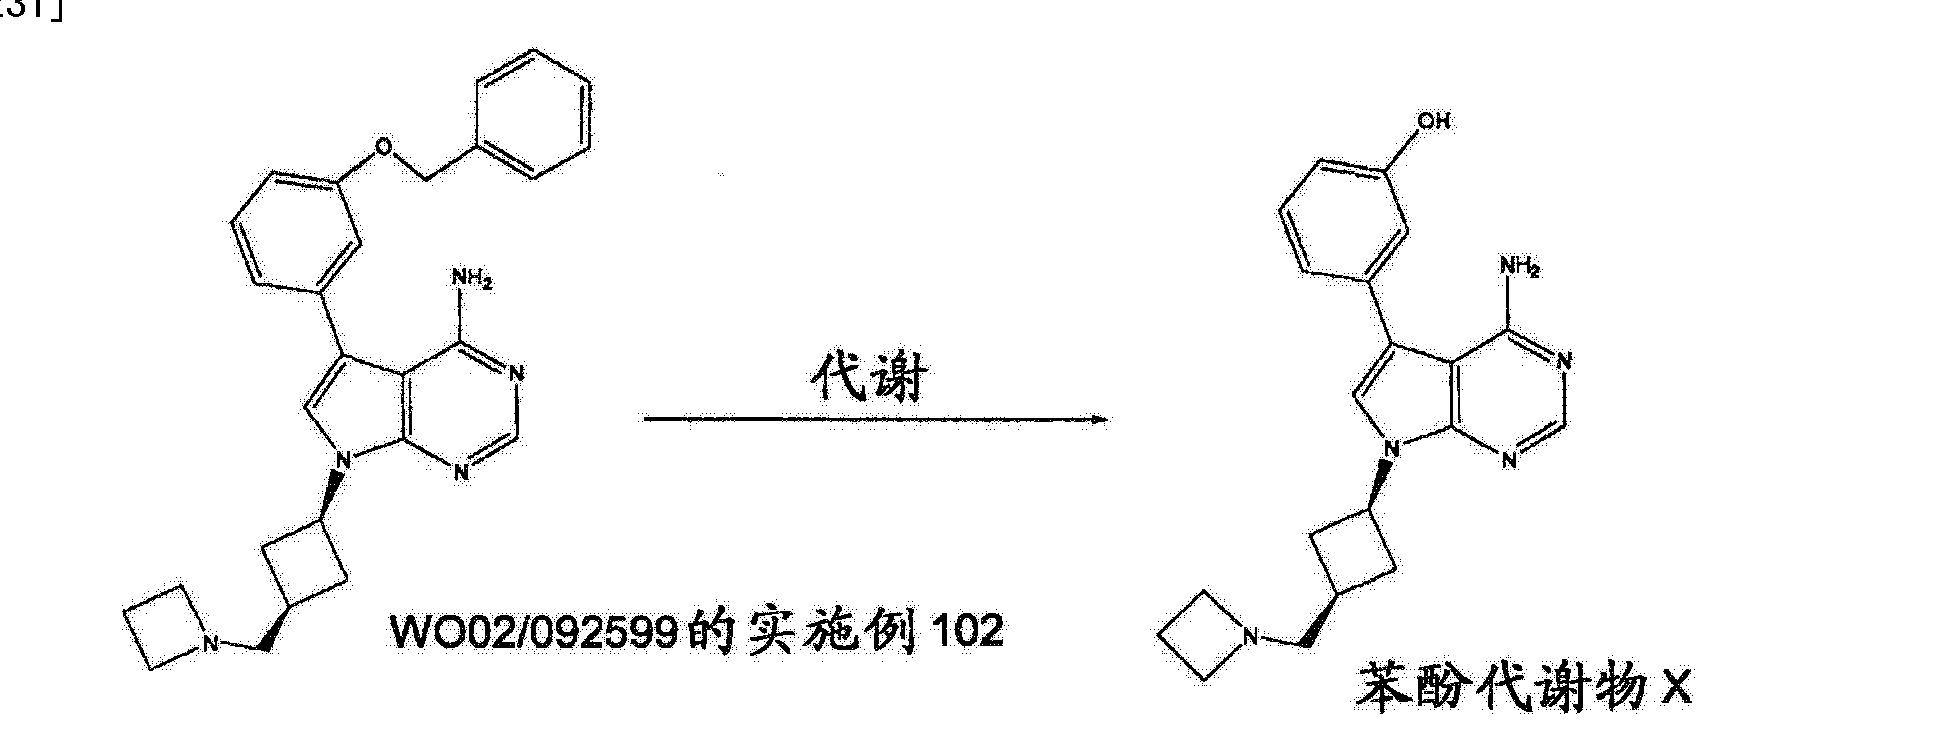 Figure CN103492390AD00271